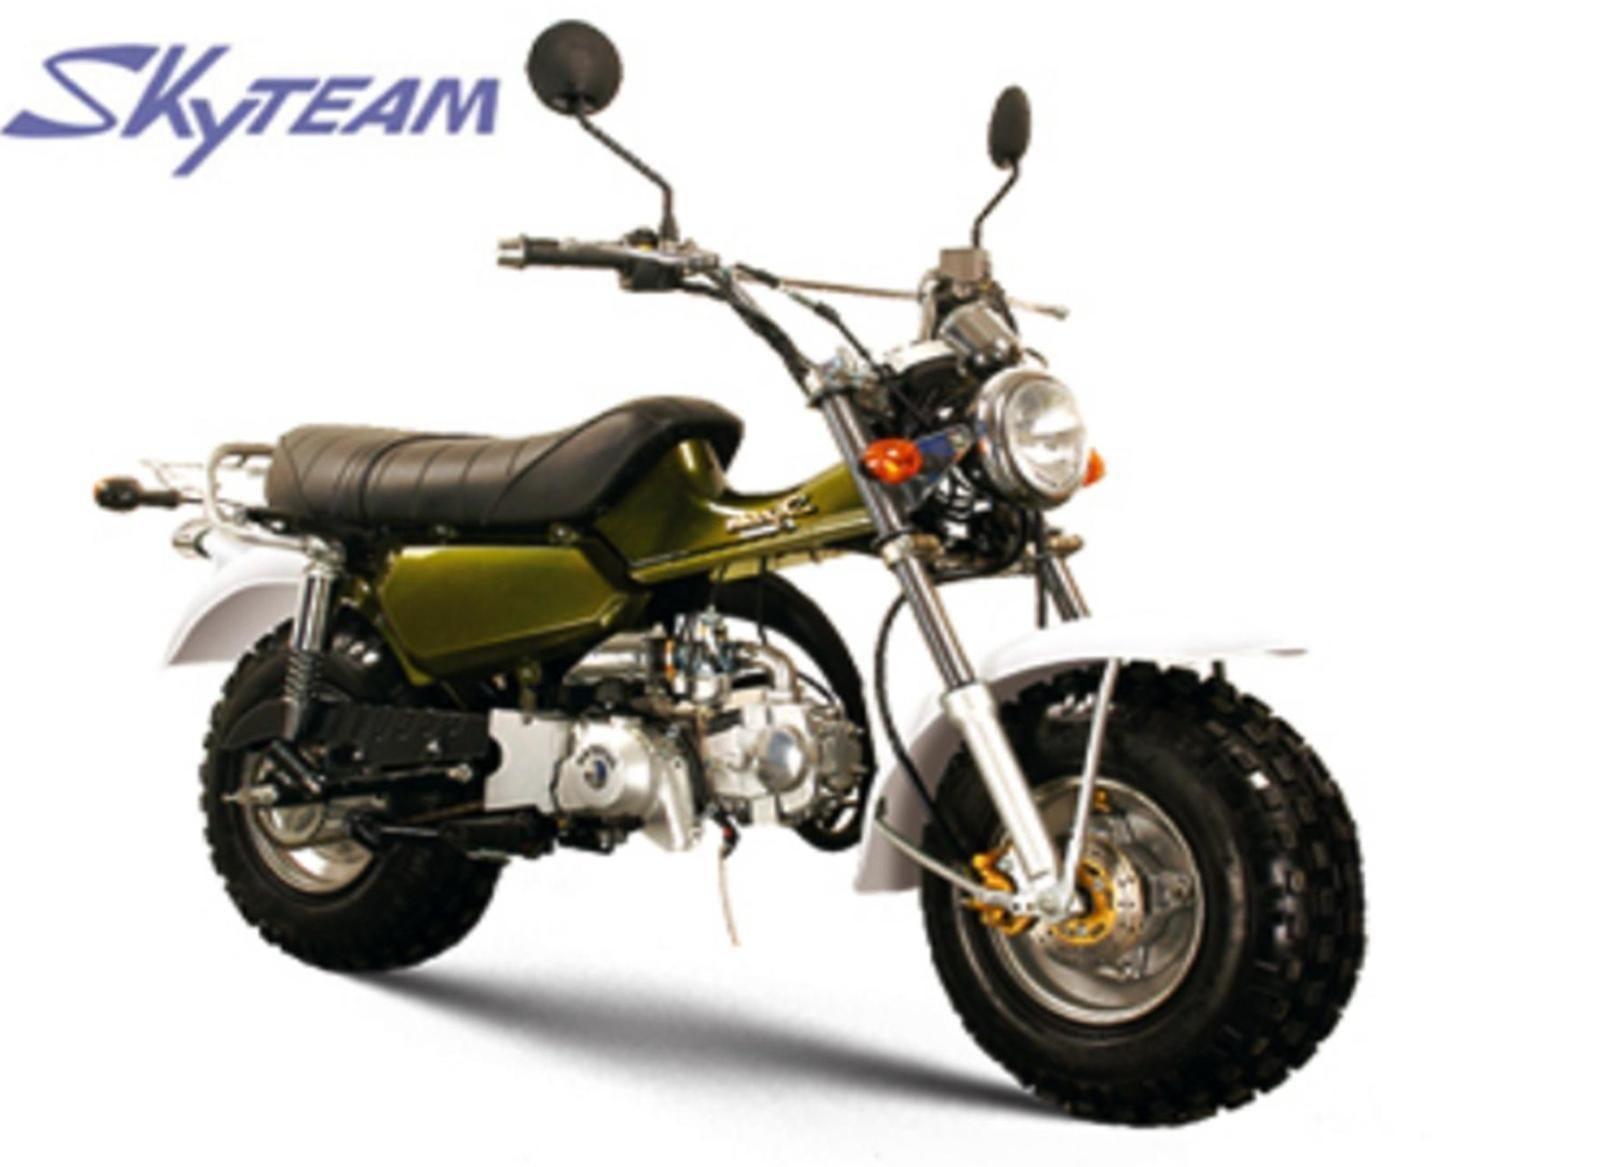 Retro Honda 50cc Motorcycle 1960s Bike